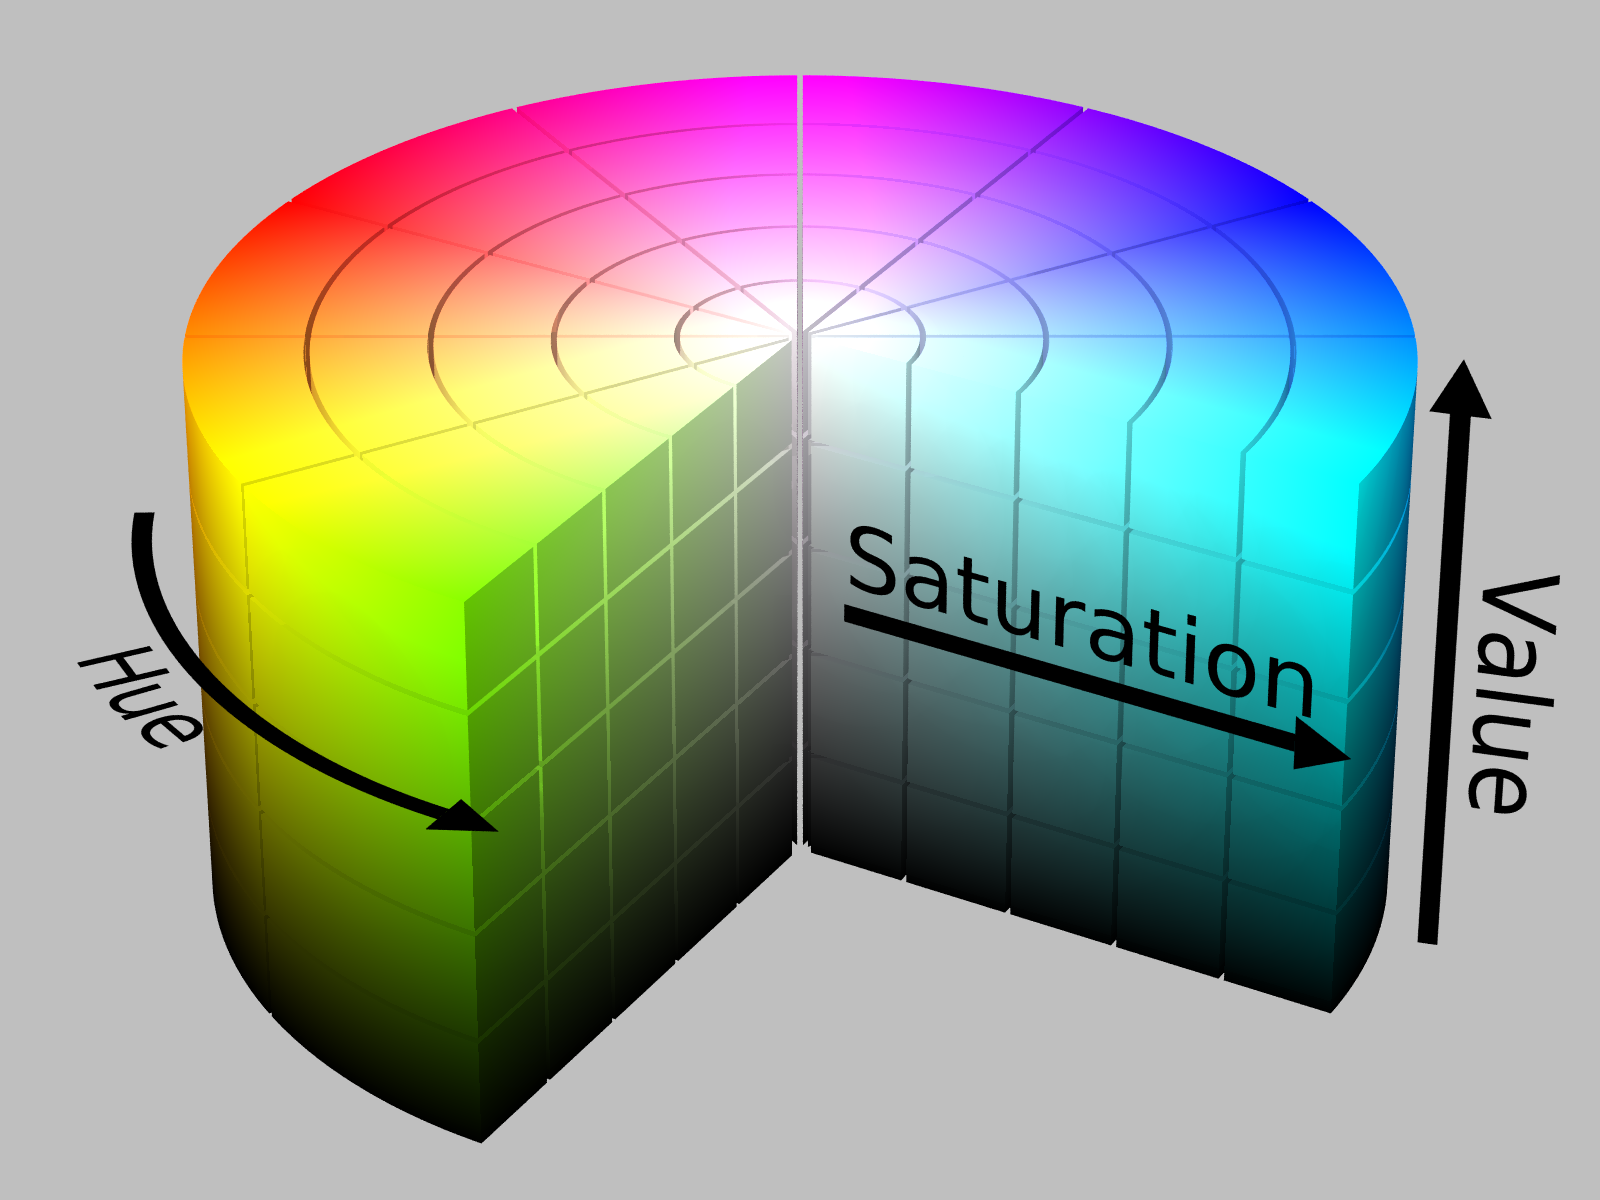 HSV_color_solid_cylinder_saturation_gray.png